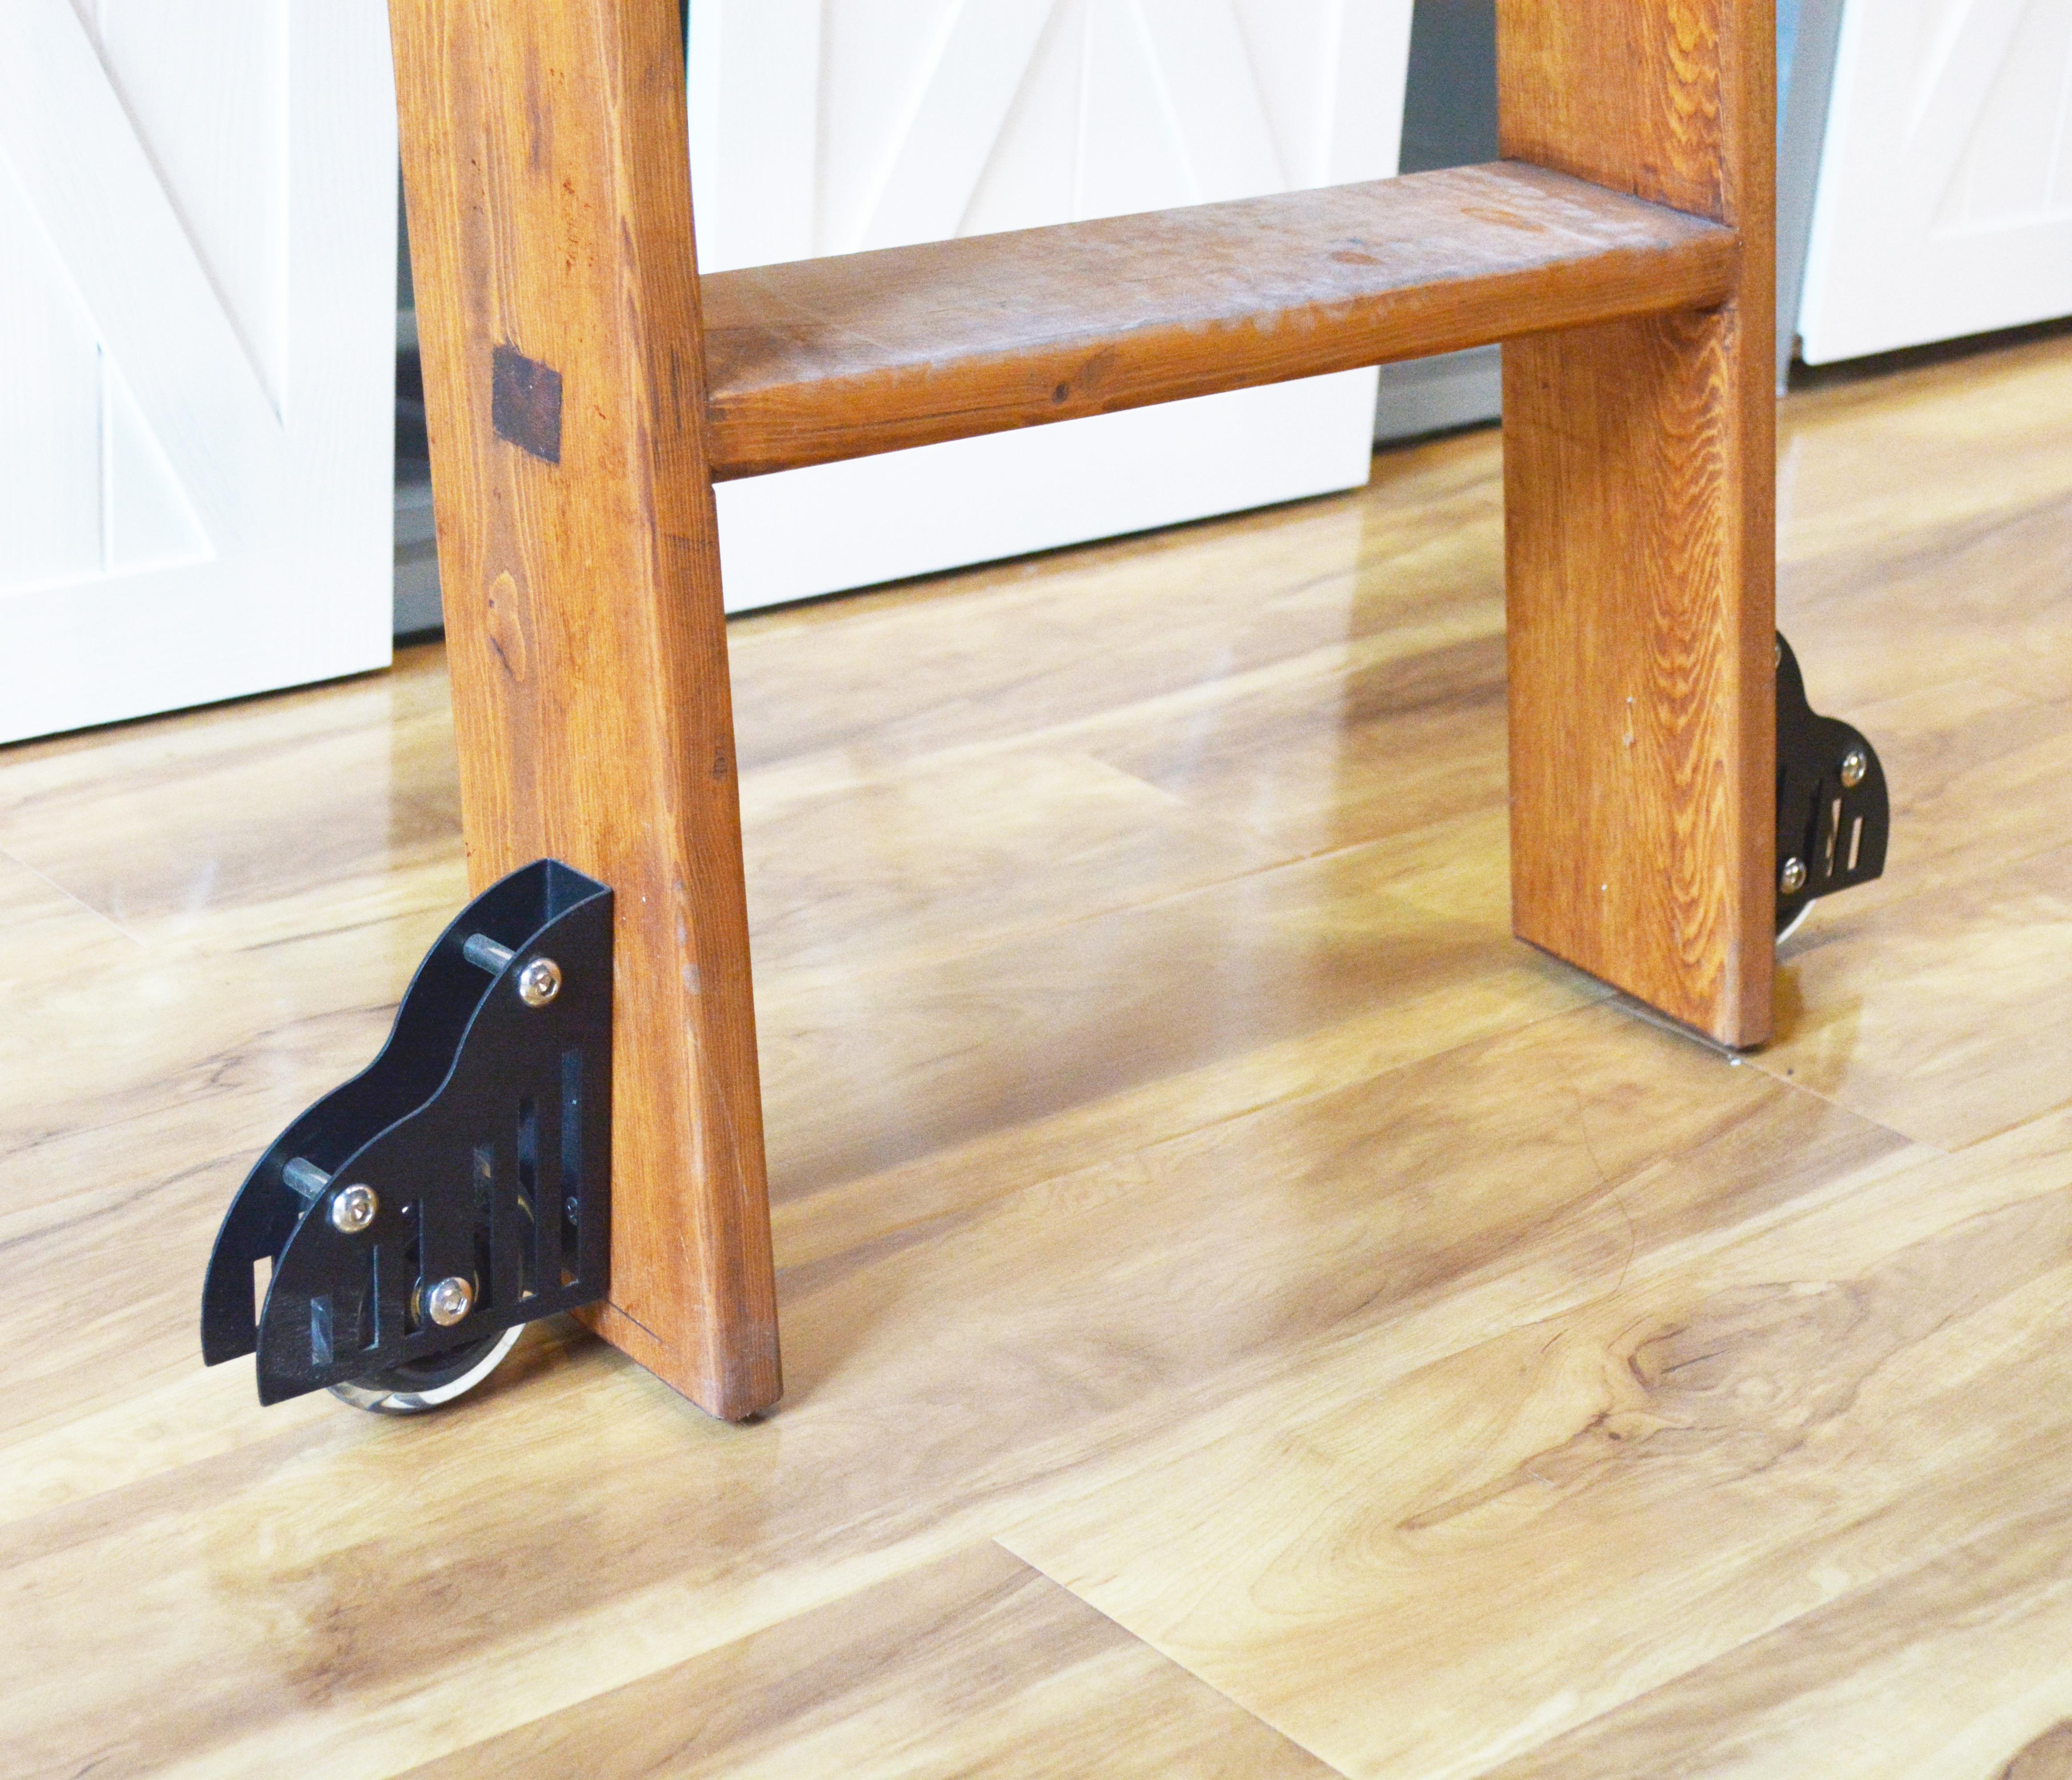 DIYHD Scorrevole Barn Scaletta Biblioteca Pavimento Rullo Mobili Pavimento Roller Set (2 pcs)